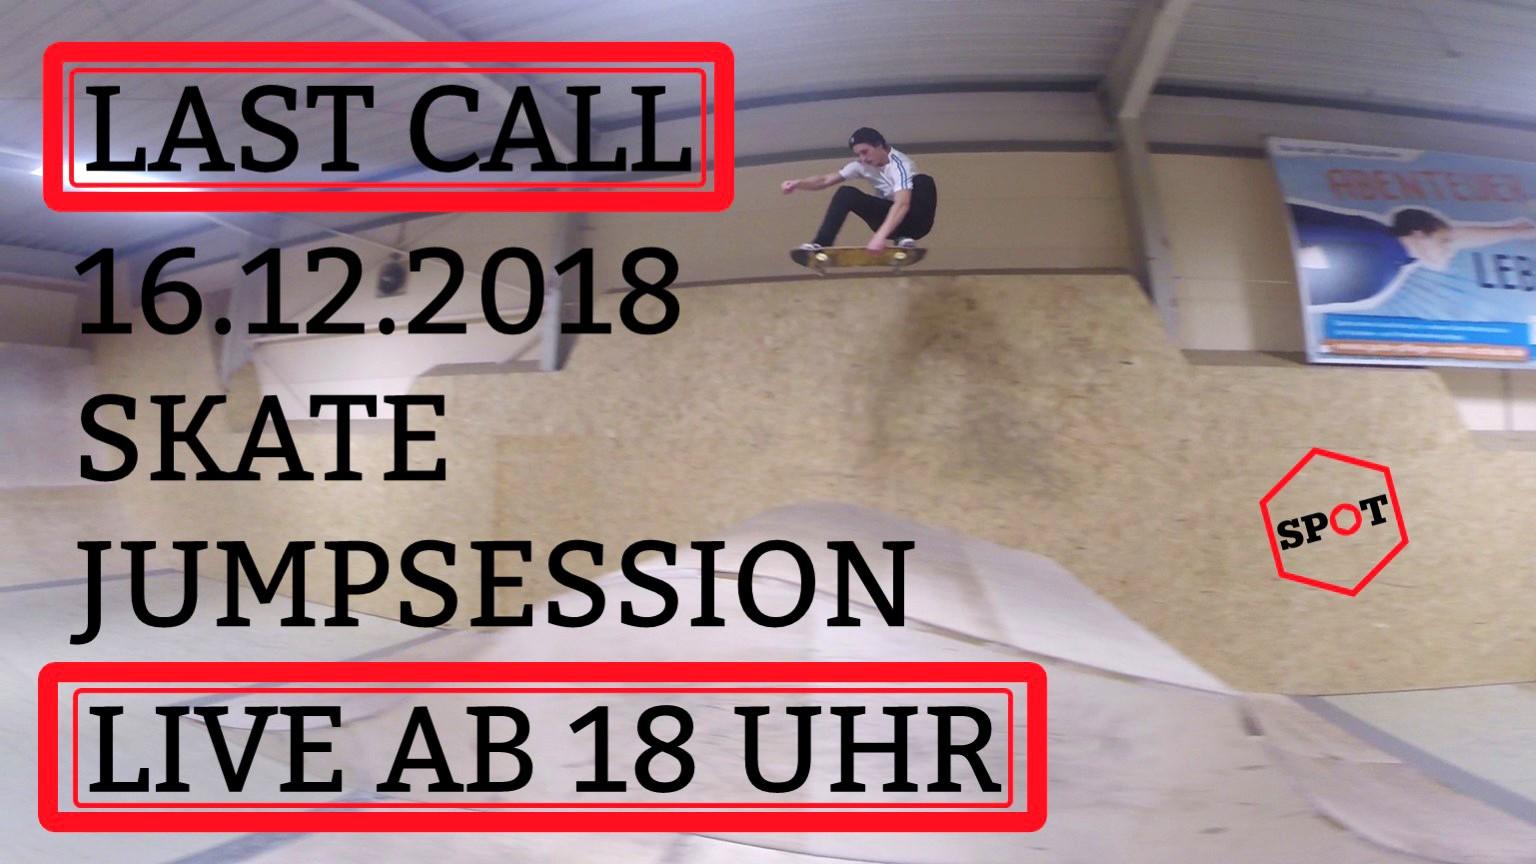 last call Skate